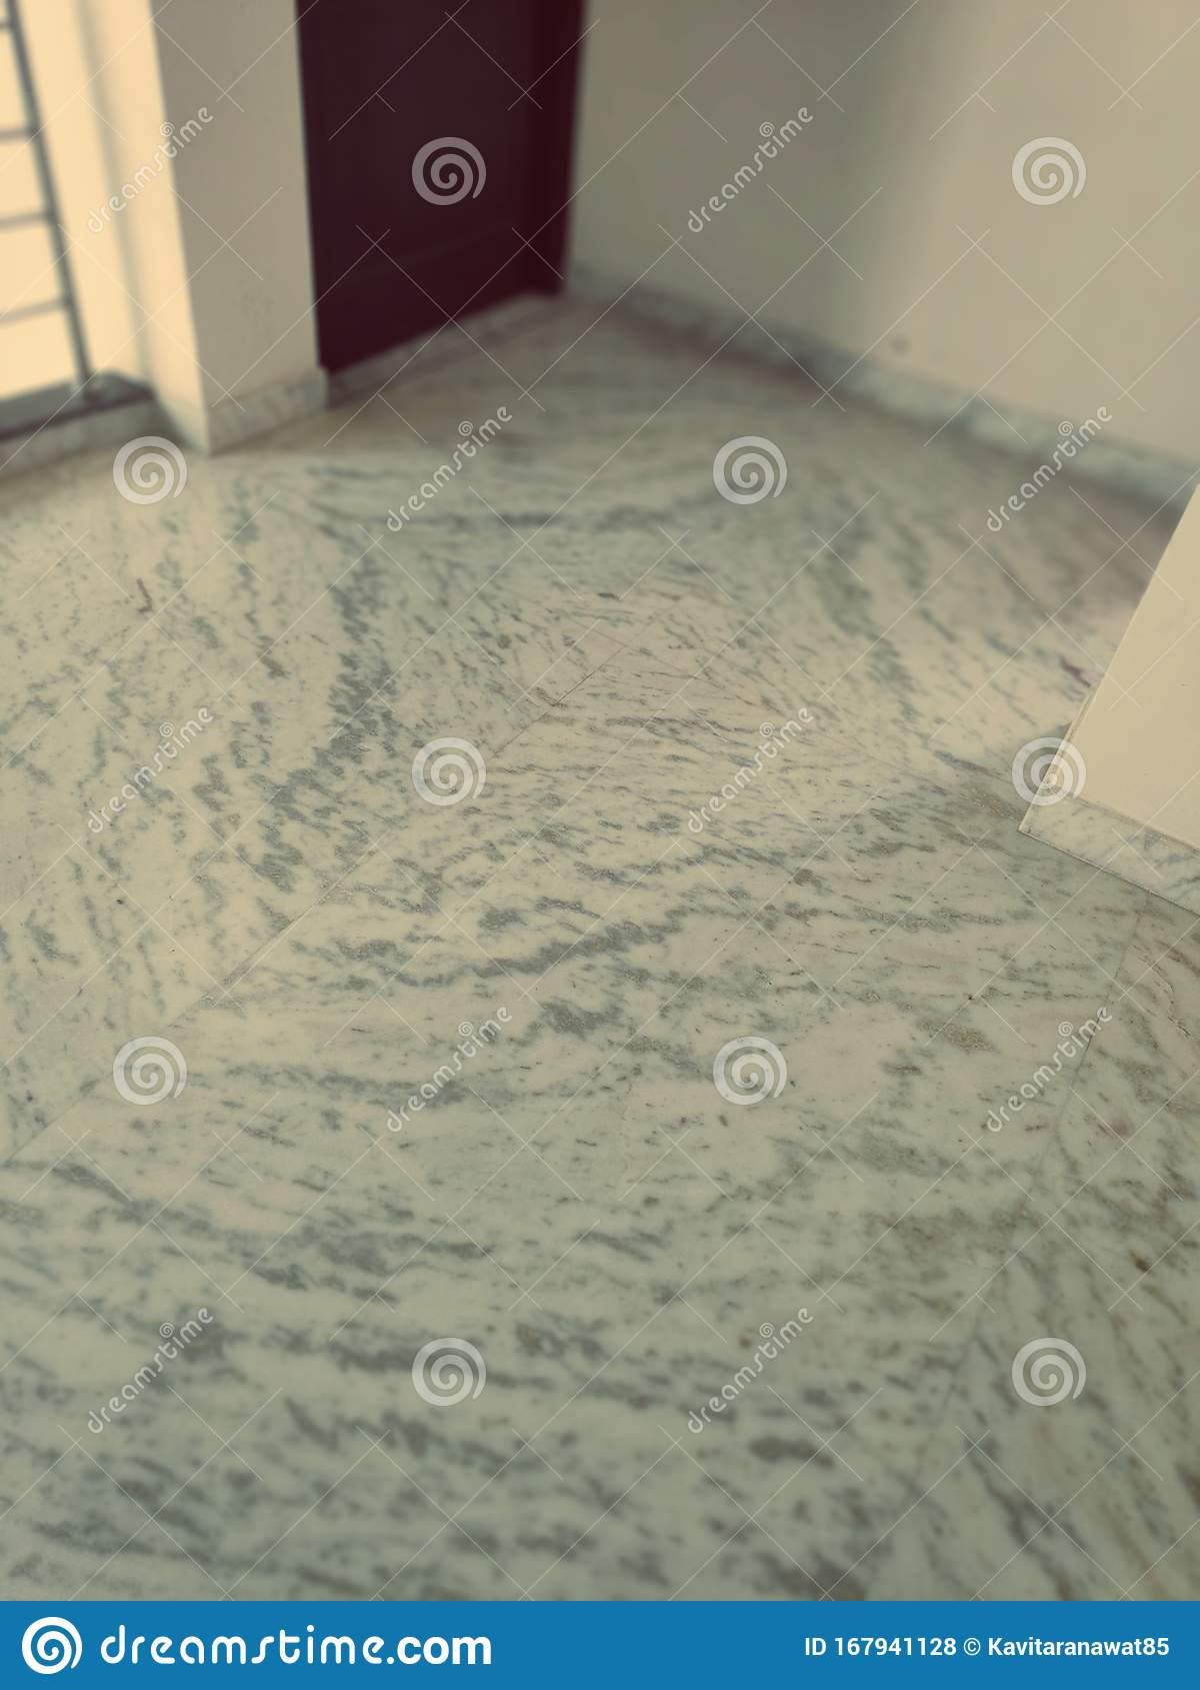 Empty Room With Marble Floor Stock Photo Image Of Background Empty 167941128